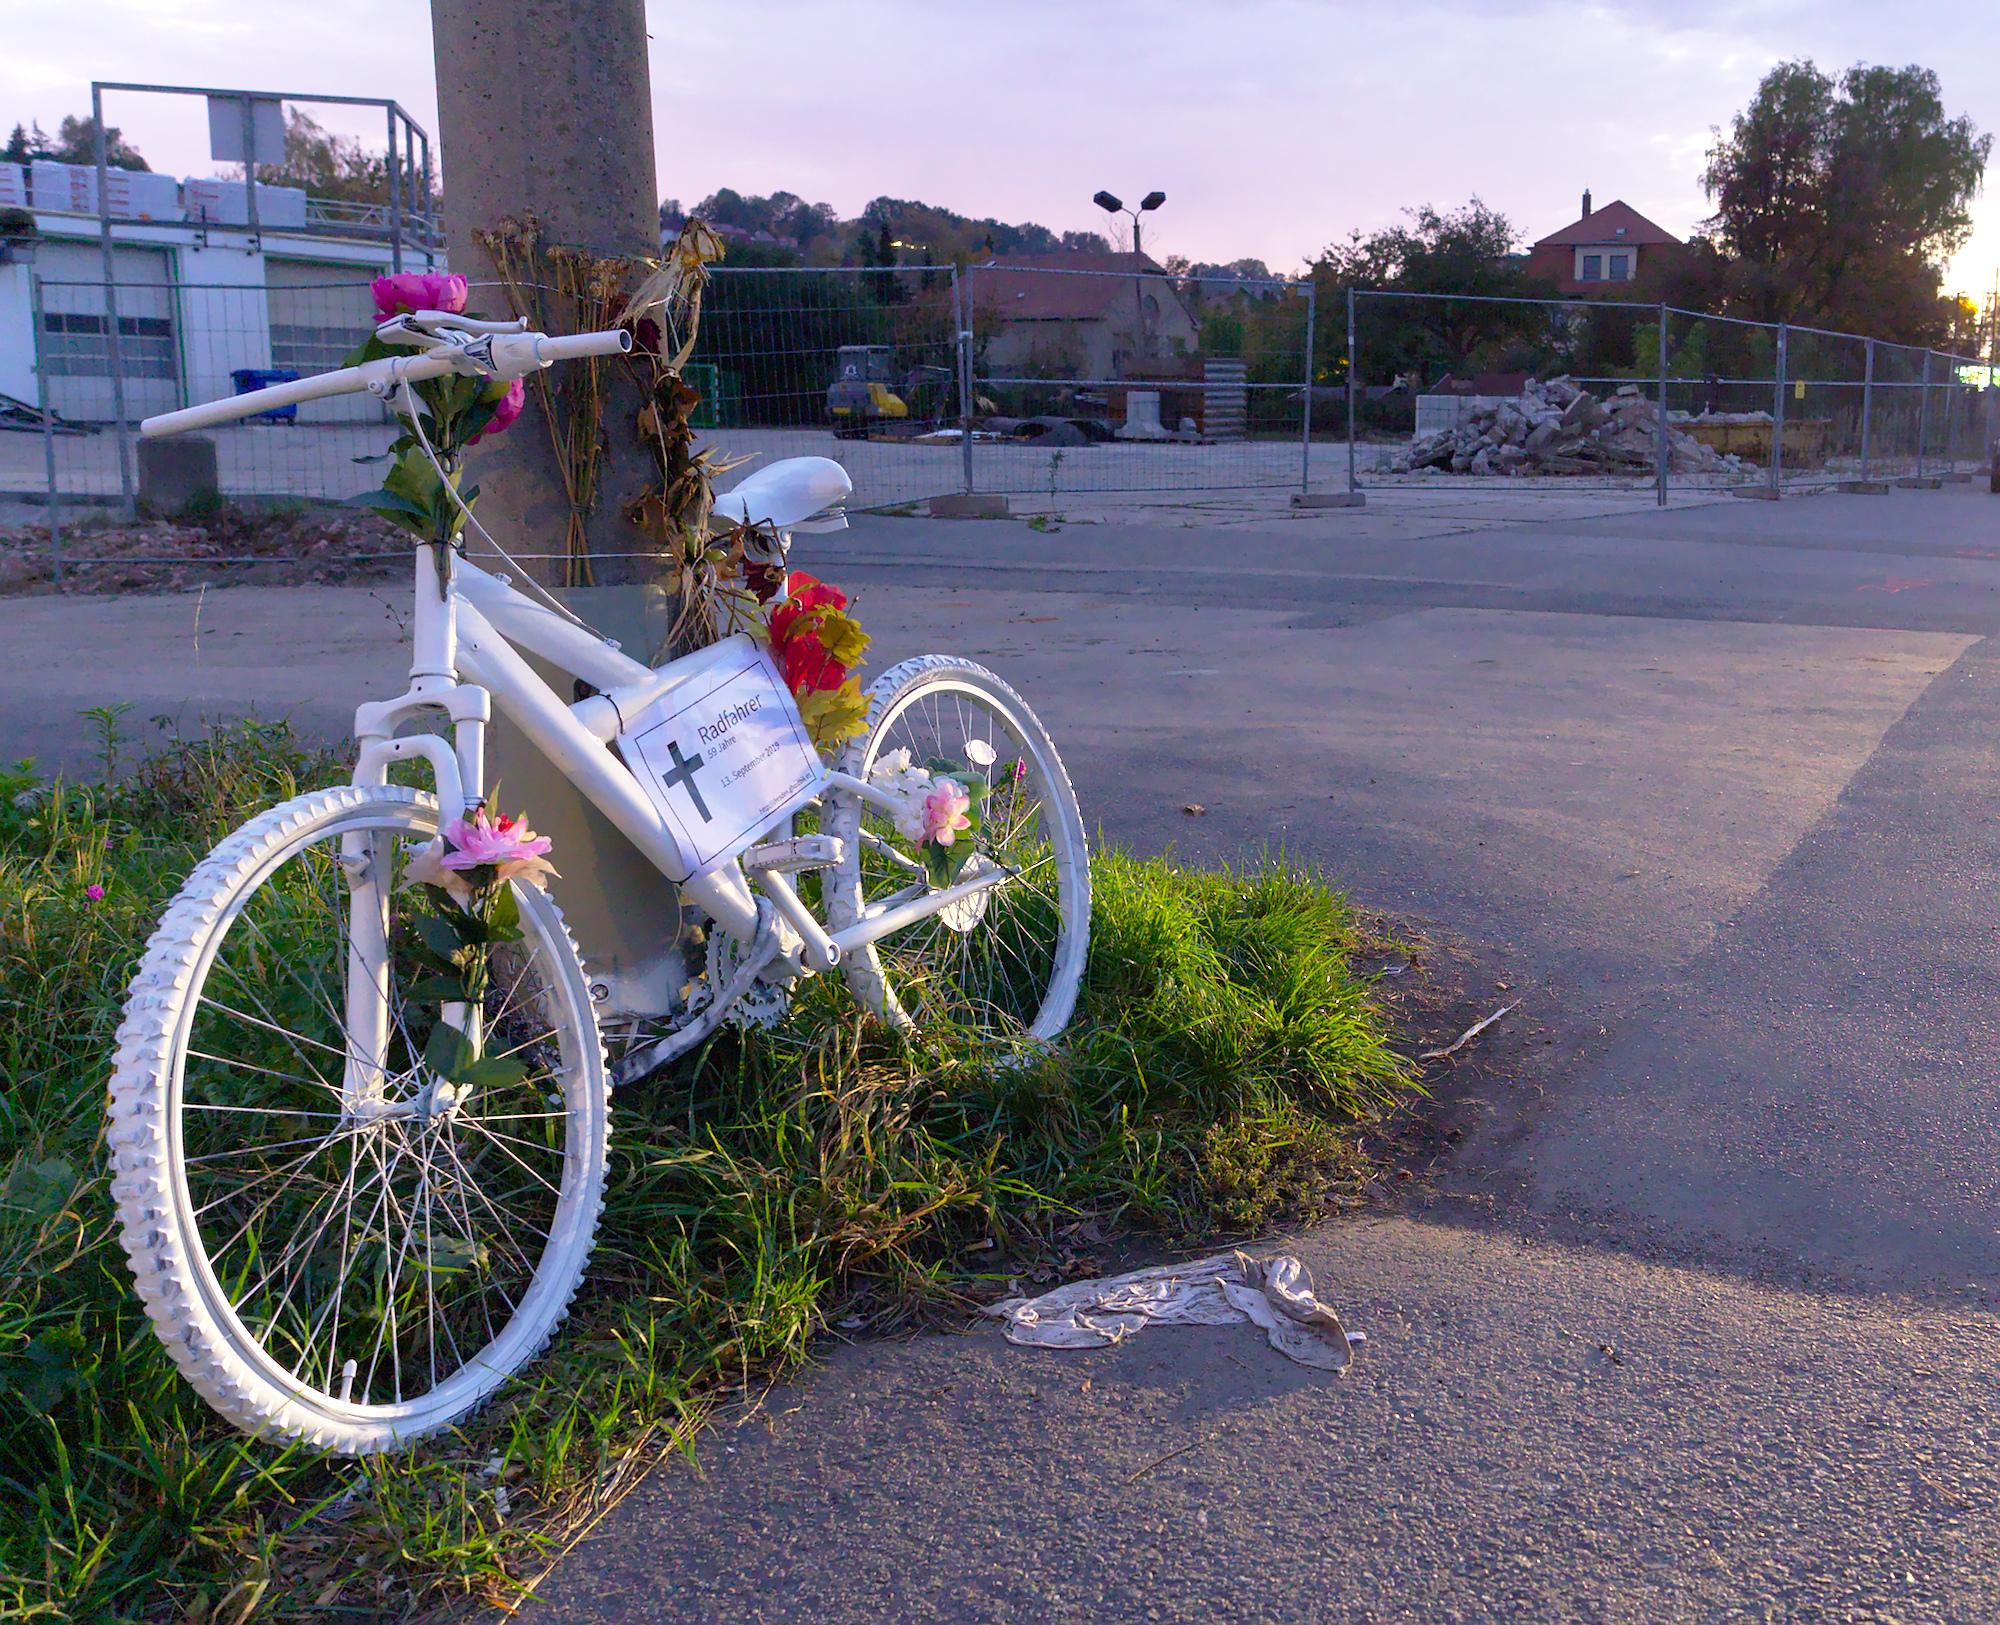 Ghostbike #11 in Heidenau